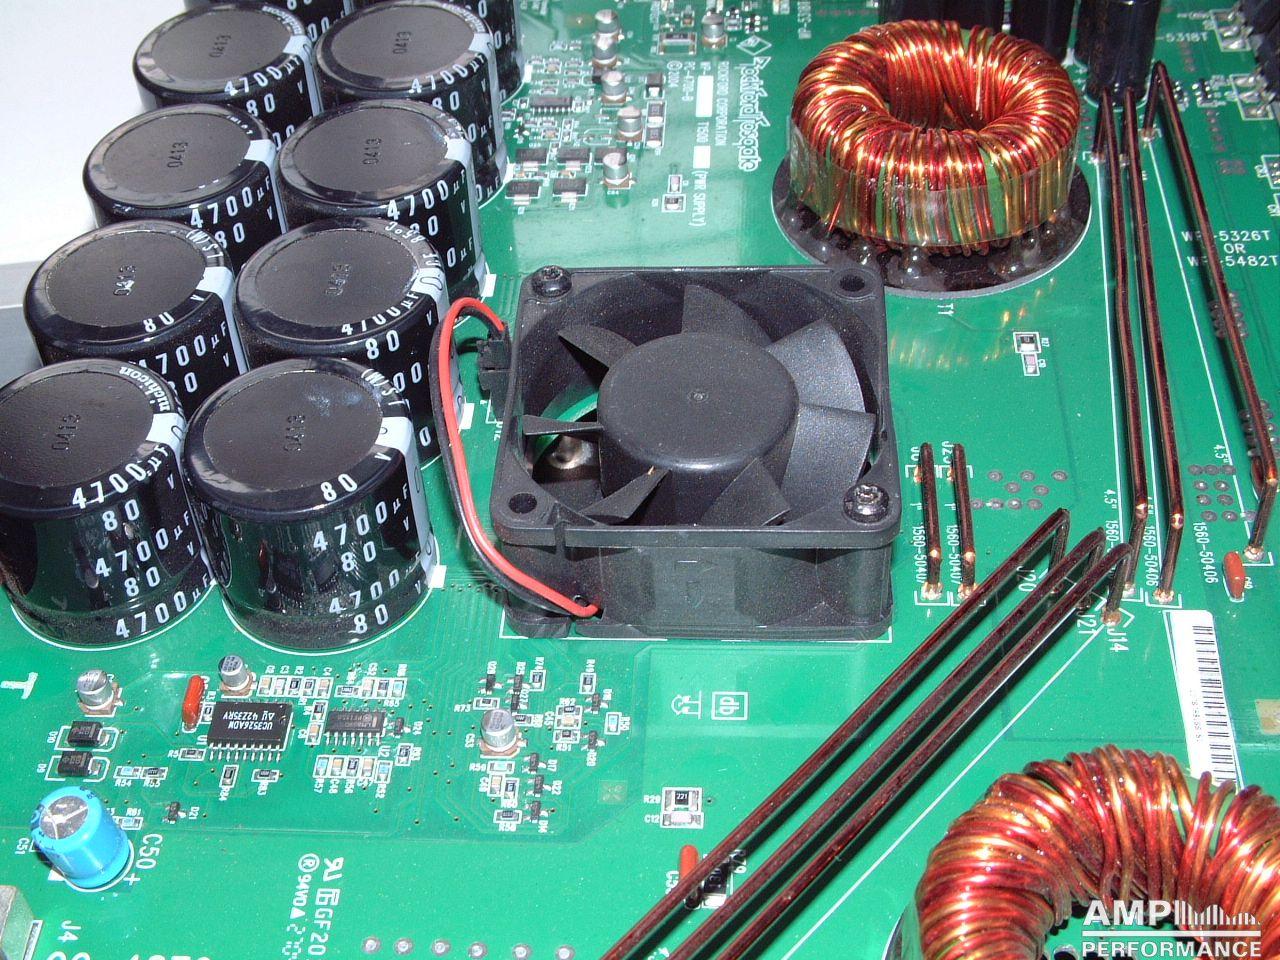 Rockford Fosgate T15004 Amp Performance Component Speakers